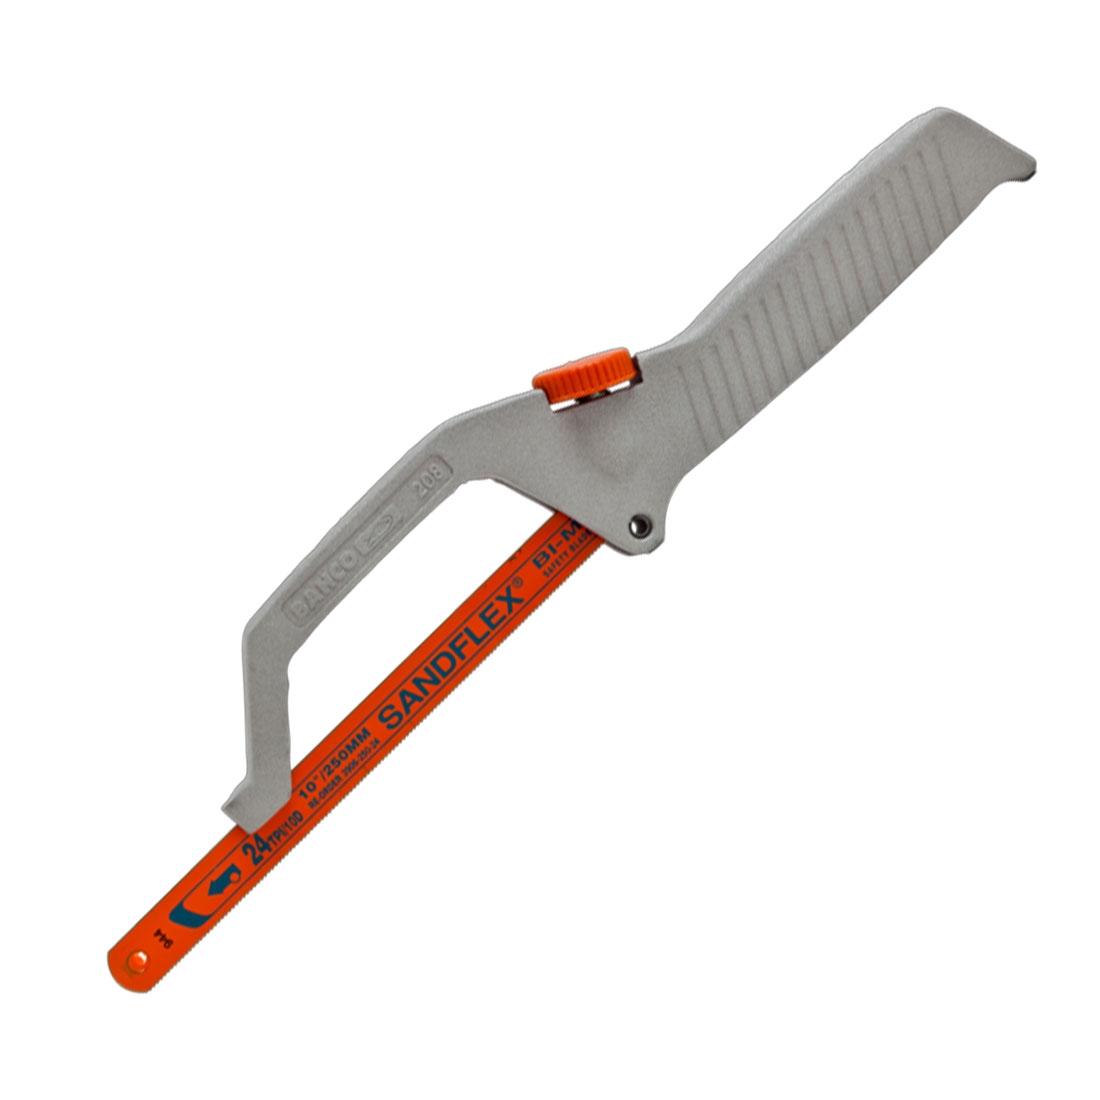 "Bahco 208 Mini Hacksaw with Blade 250mm/10"""